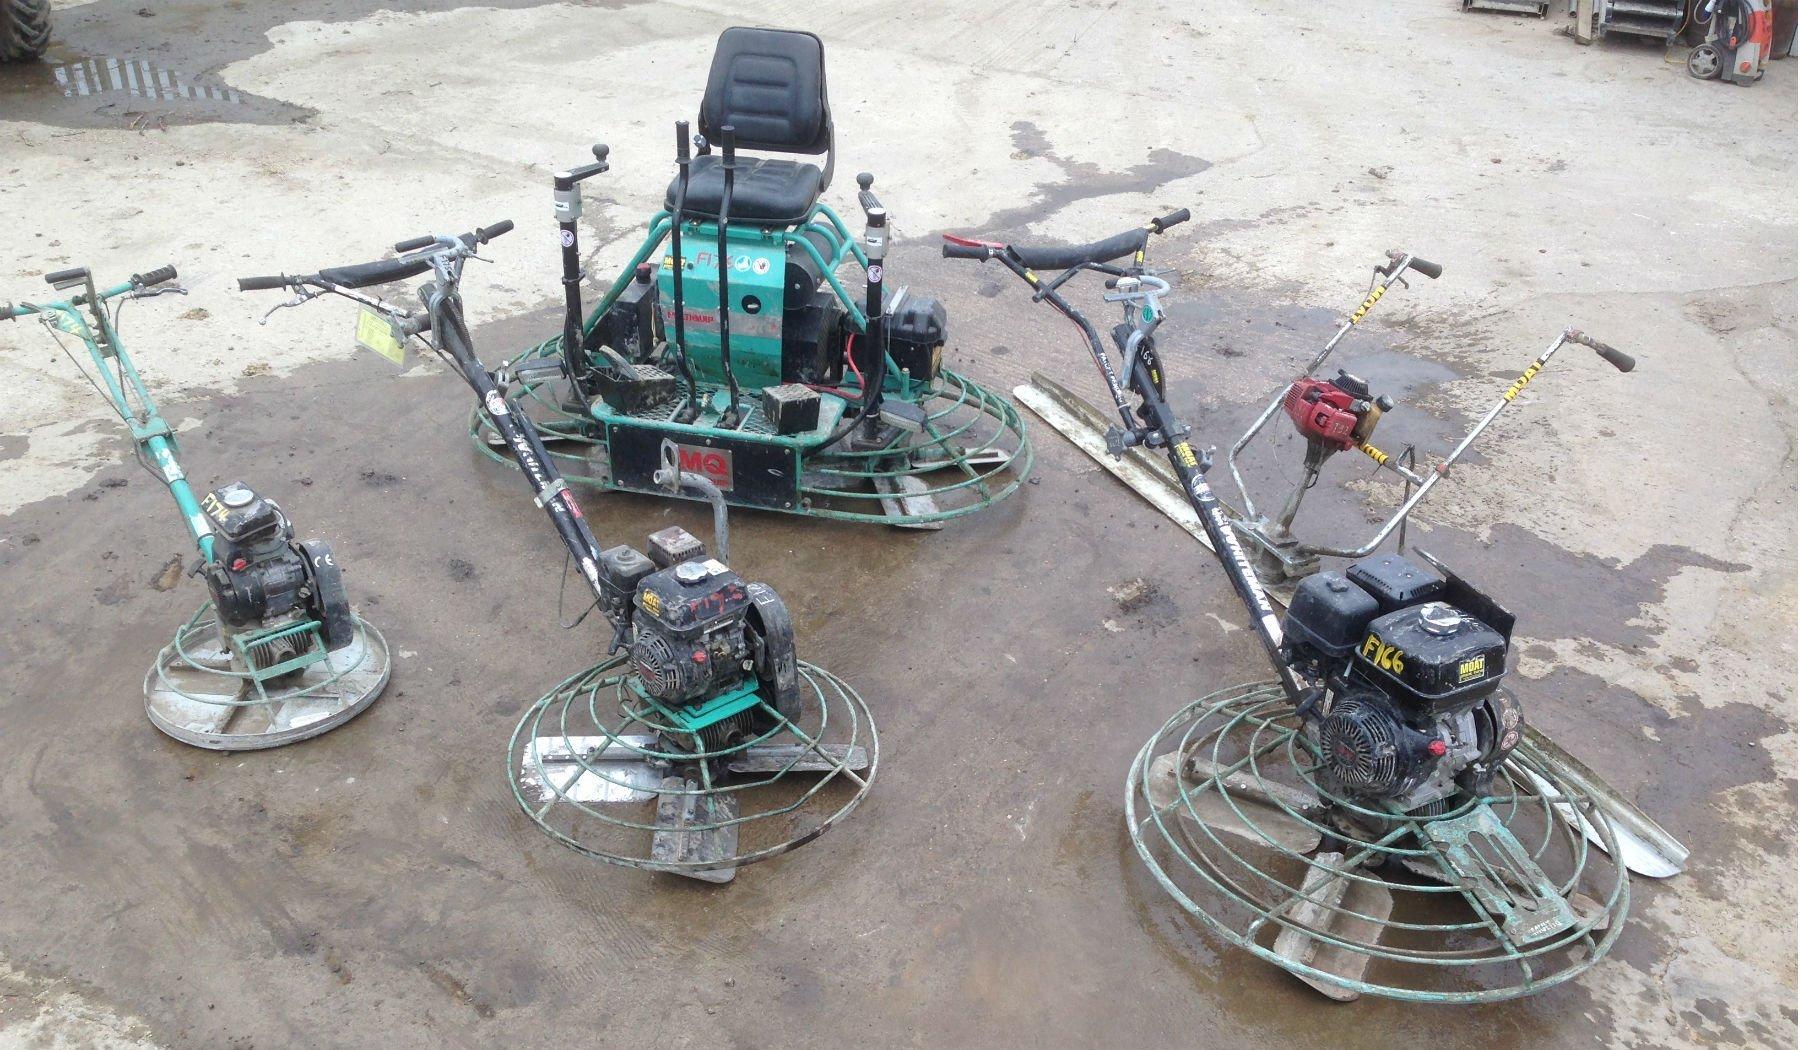 a wide range of equipment